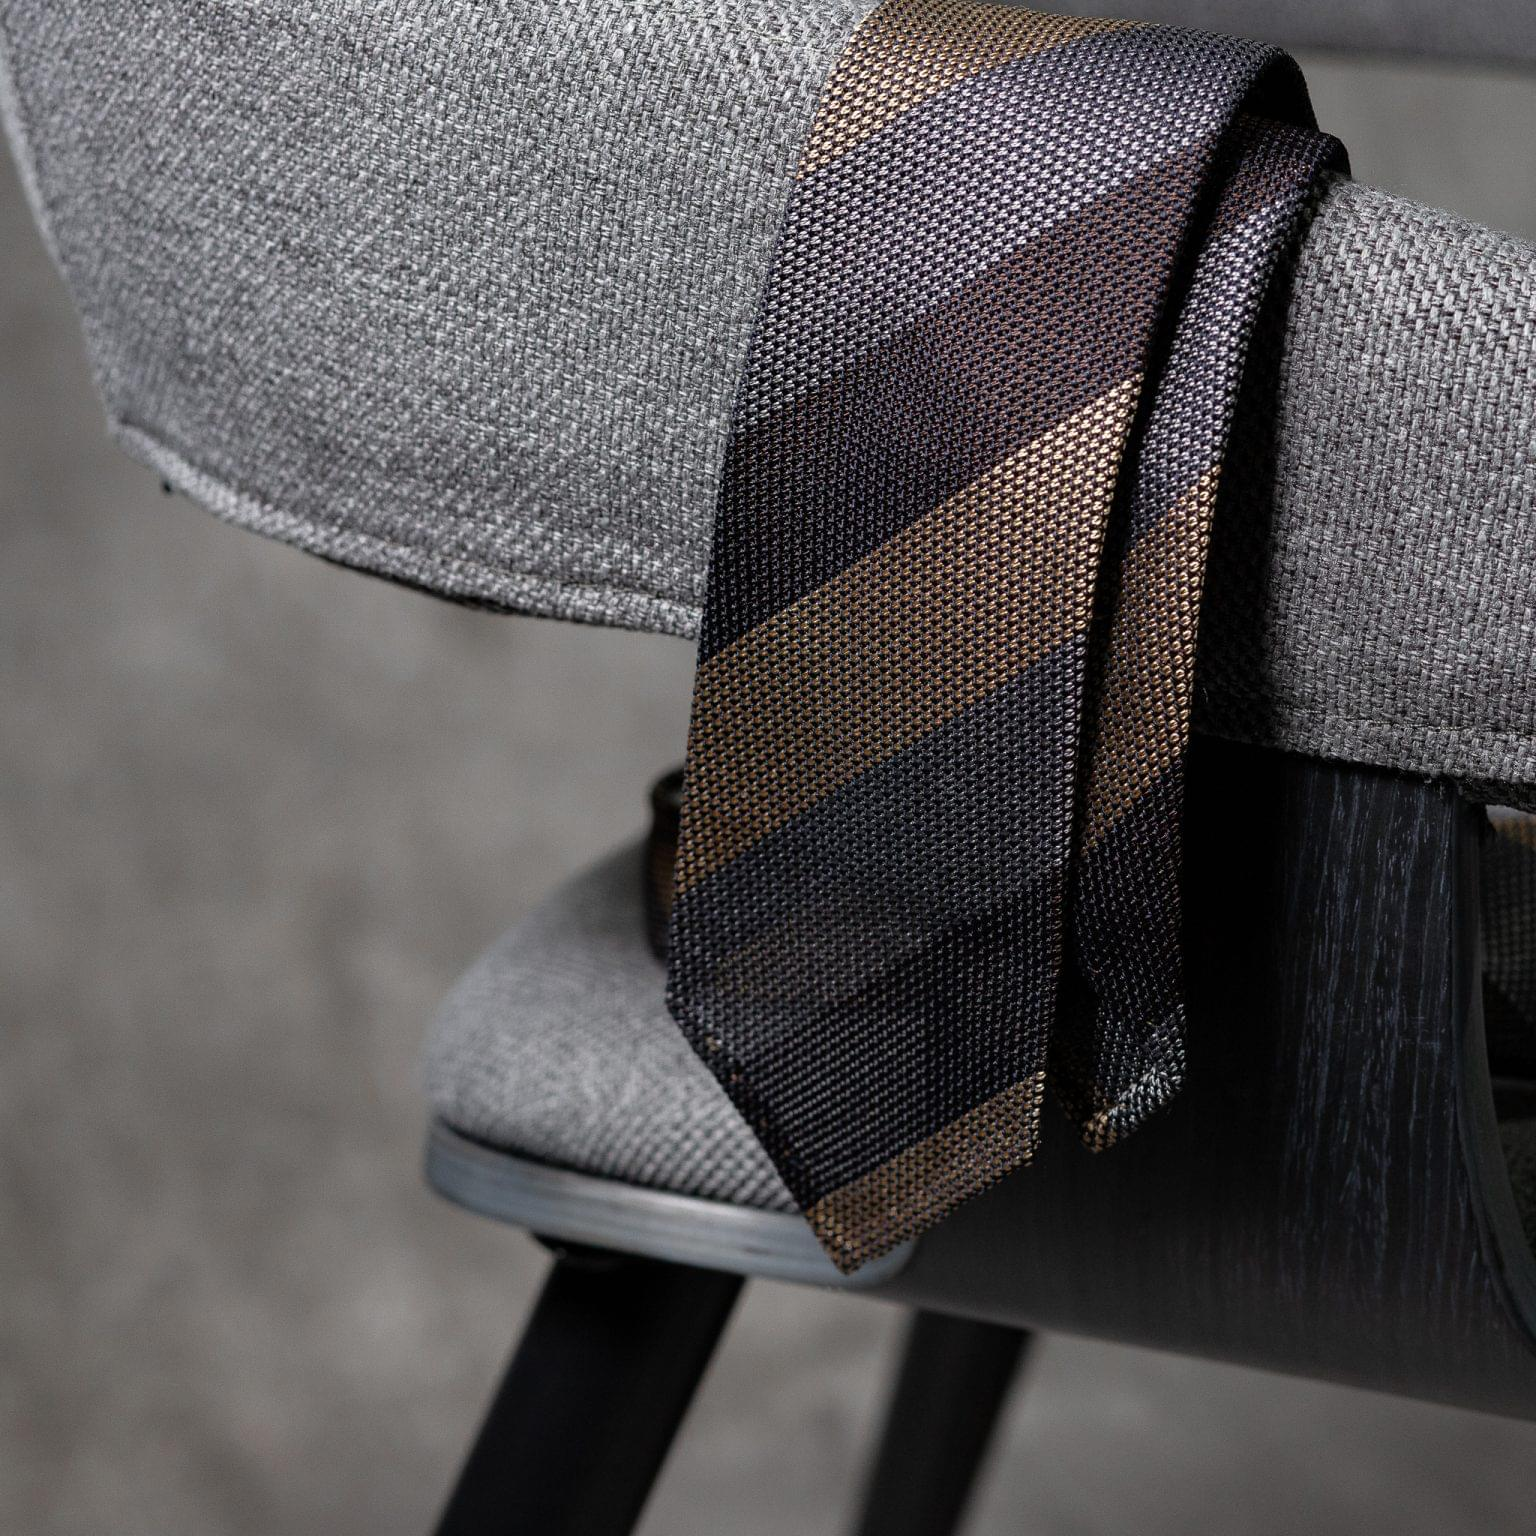 GRENADINE-0532-Tie-Initials-Corbata-Iniciales-The-Seelk-2